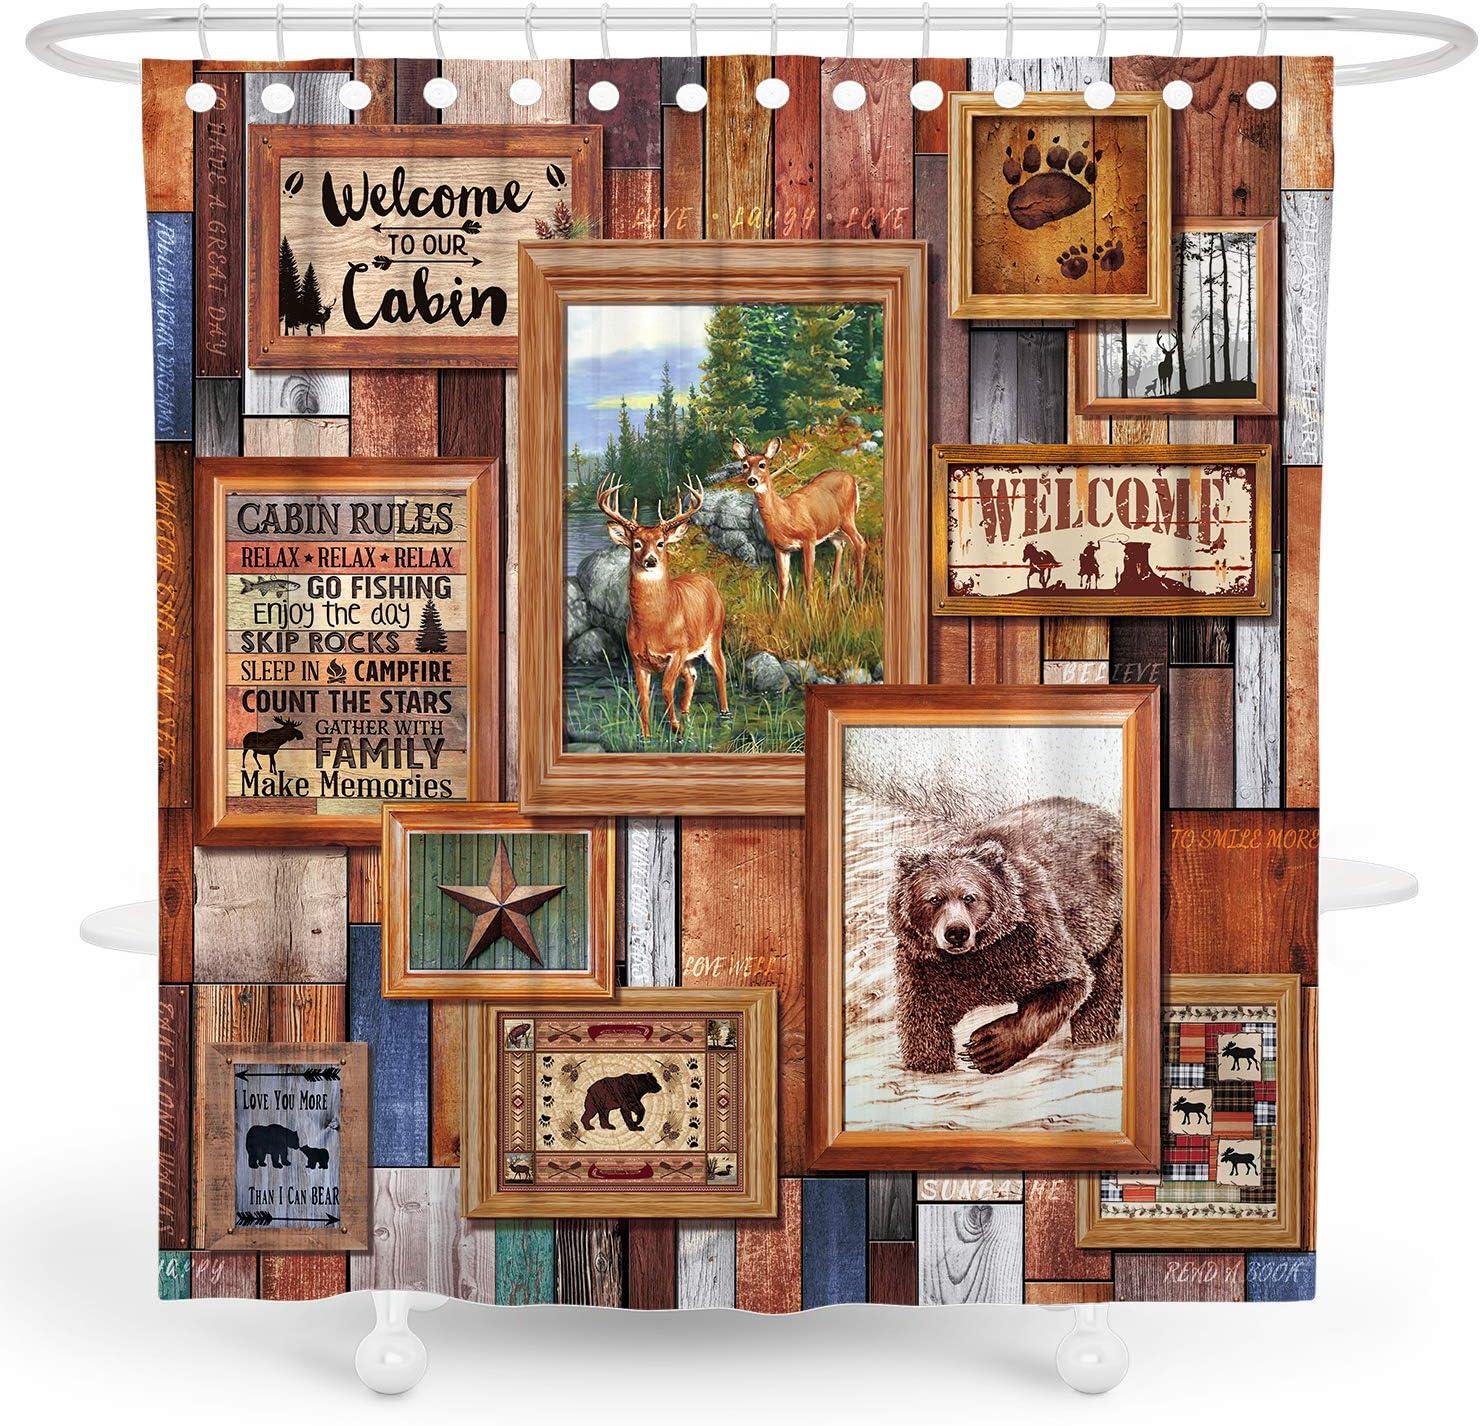 DESIHOM Brown Cabin Shower Curtain Primitive Rustic Shower Curtain Wood Country Shower Curtain Deer Bear Bathroom Decor Polyester Waterproof Shower Curtain 72x72 Inch